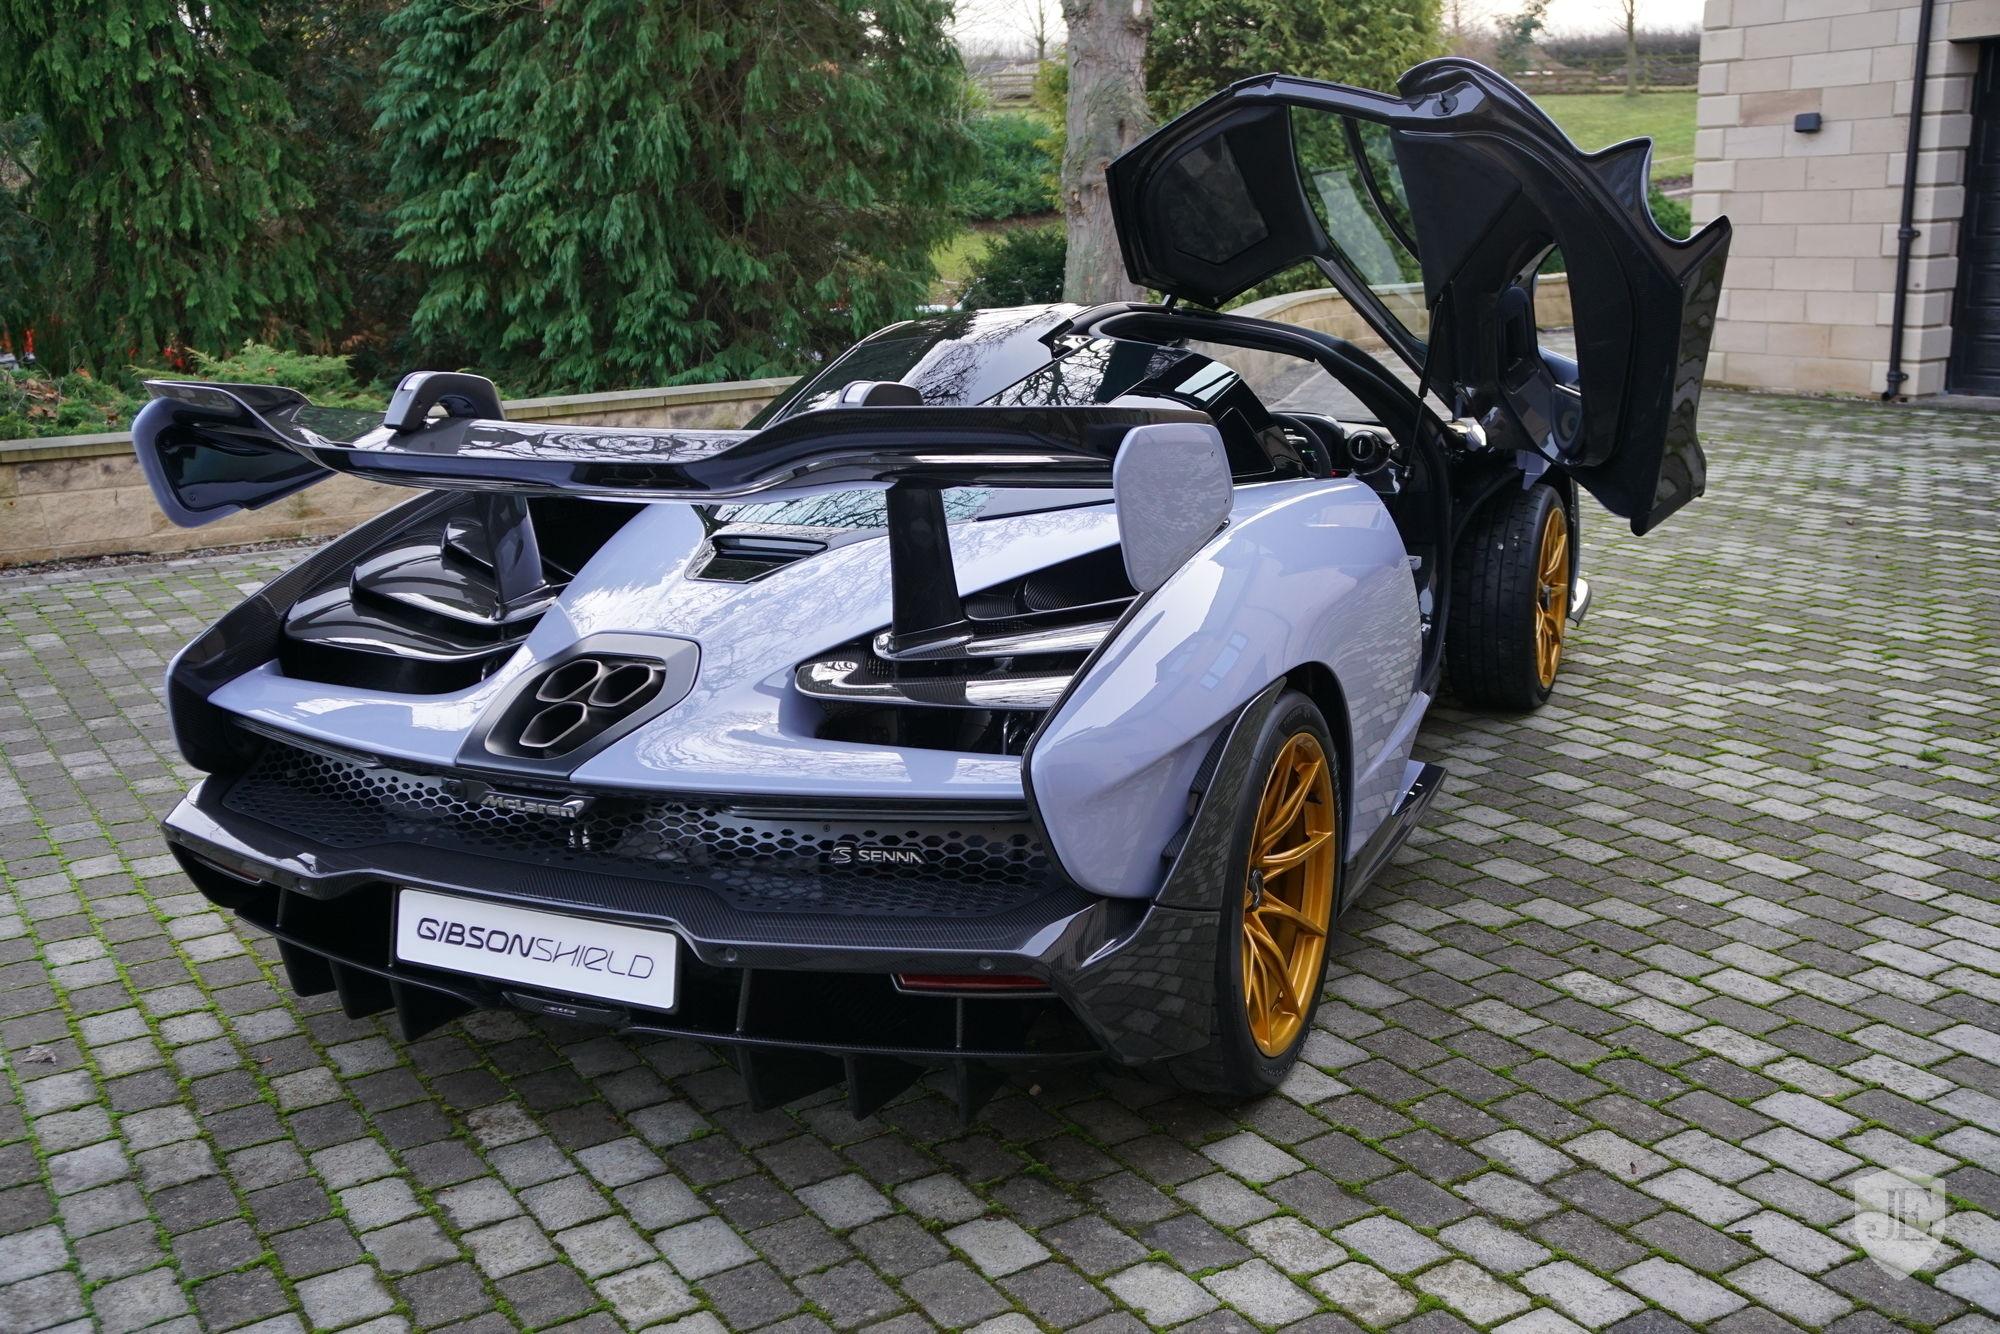 McLaren_Senna_for_sale_0009